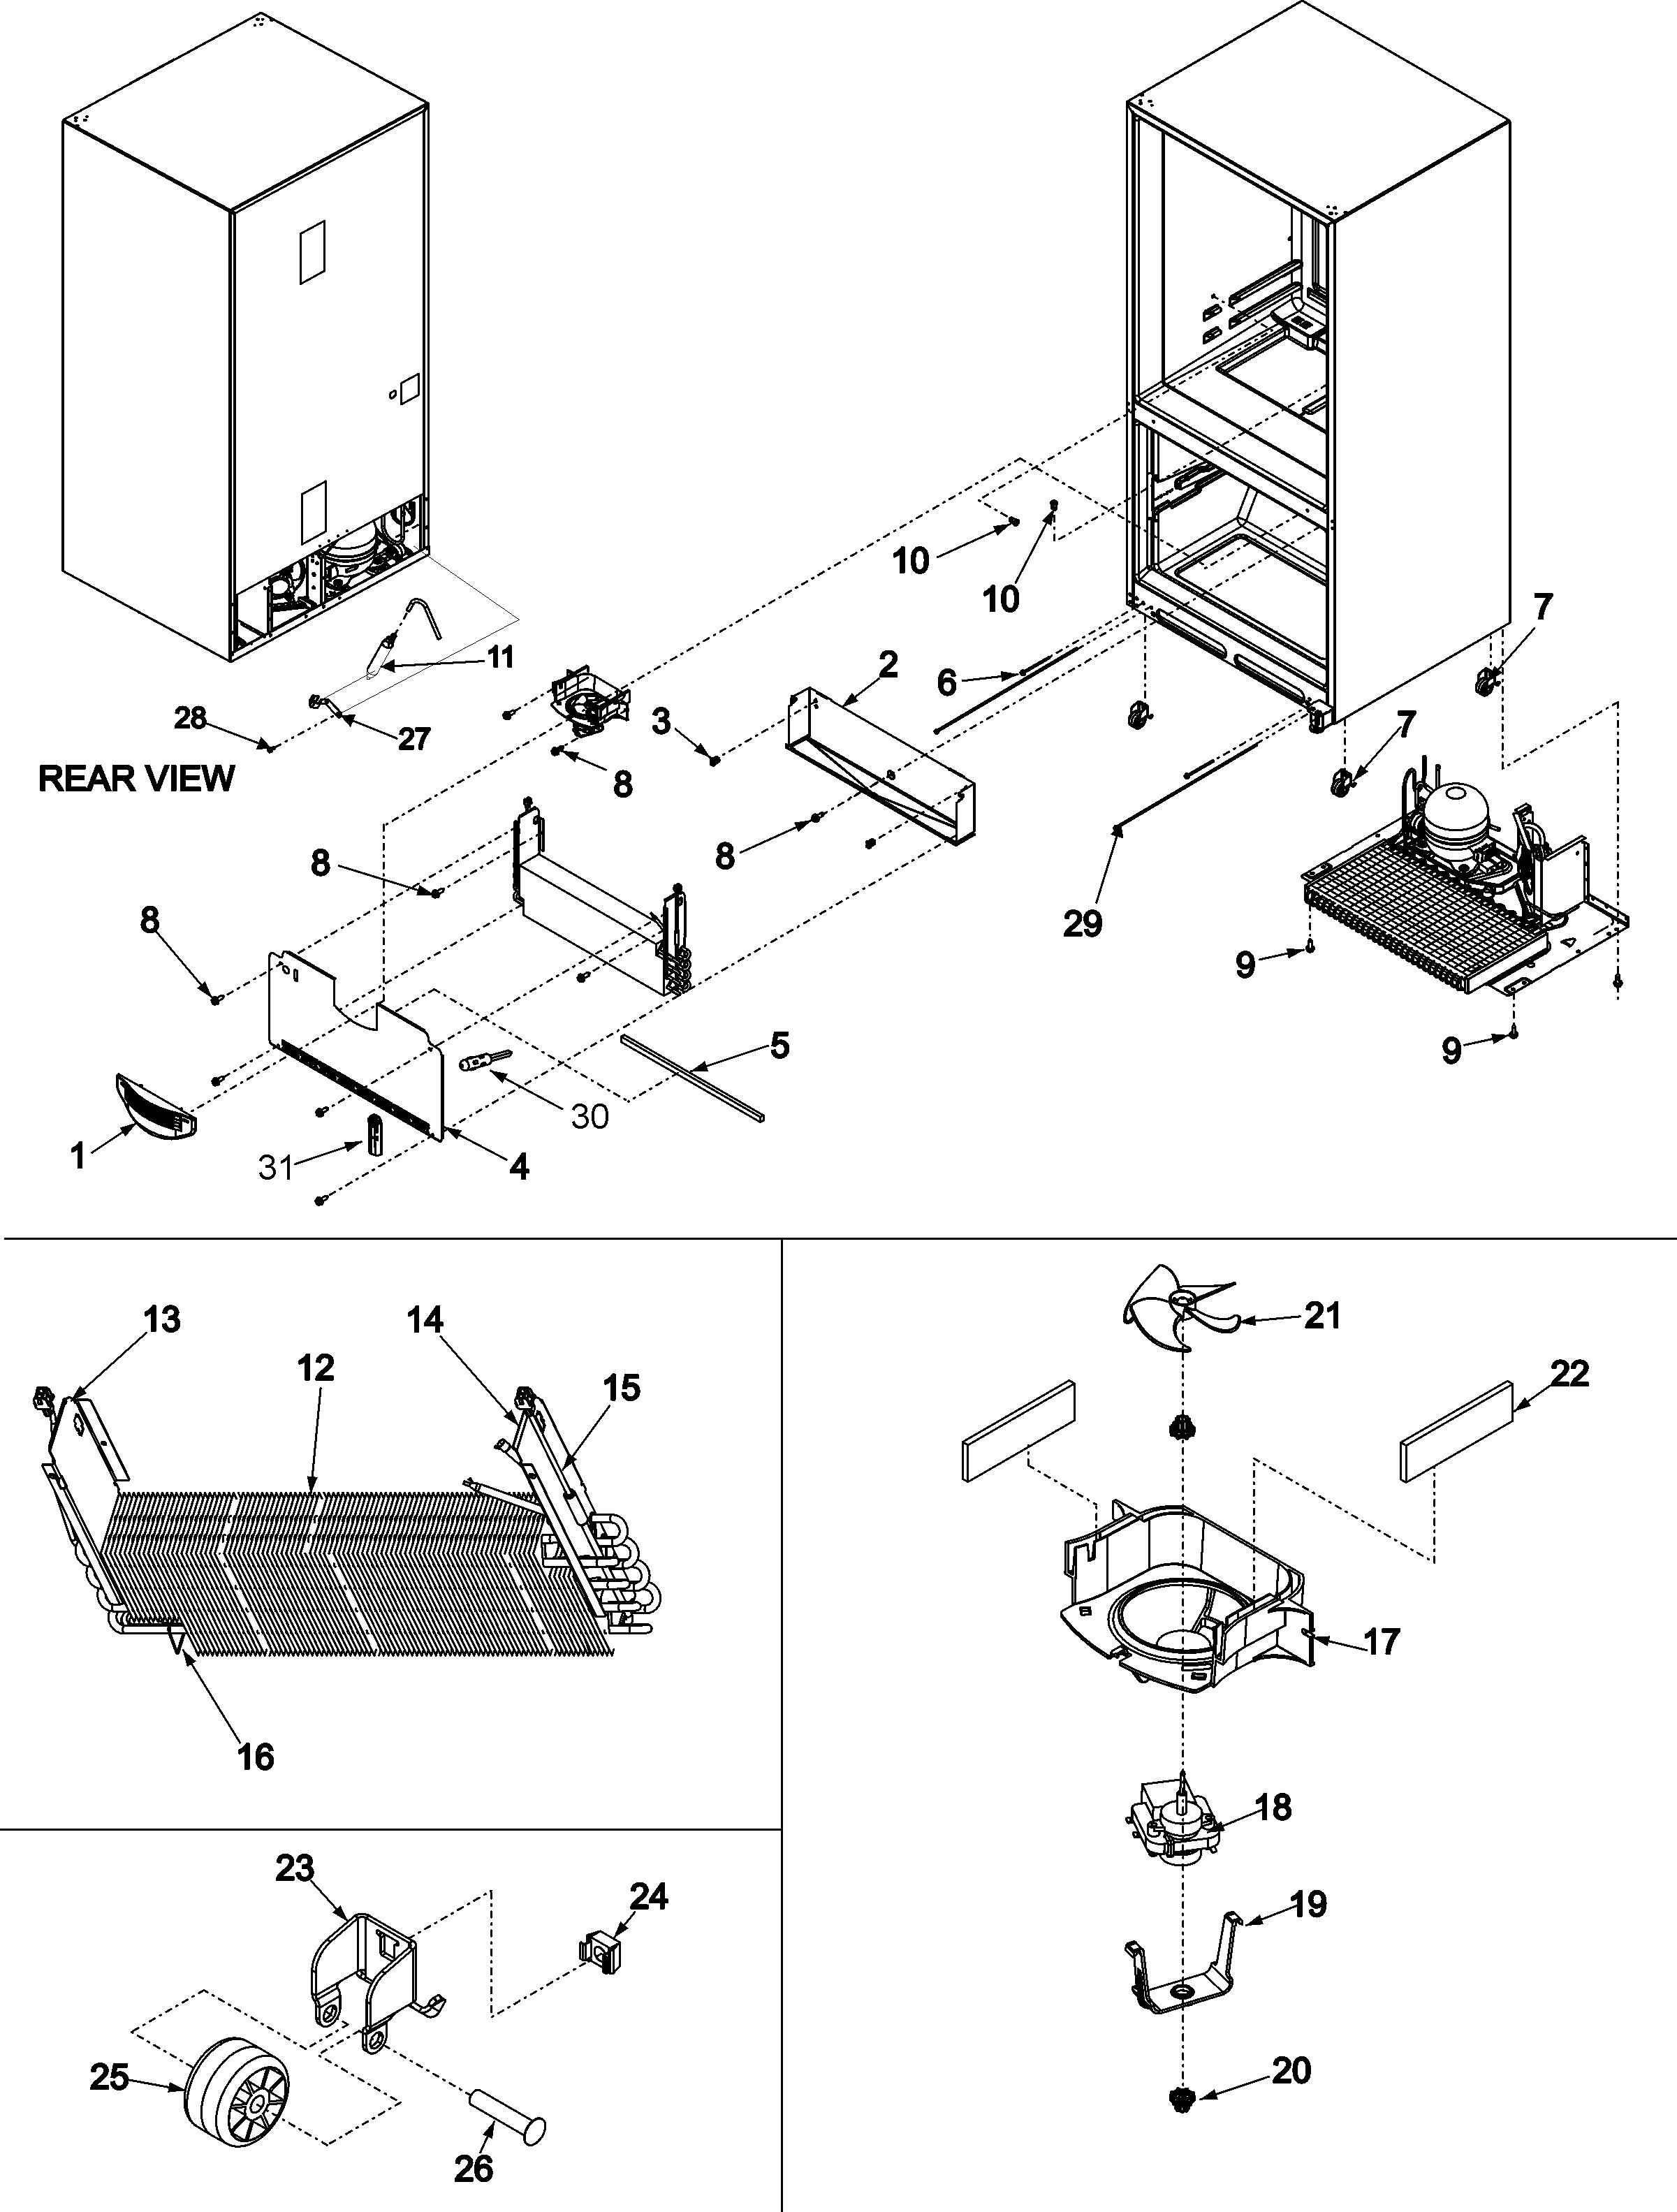 Fine Maytag Model Mfd2561Hew Bottom Mount Refrigerator Genuine Parts Wiring Cloud Animomajobocepmohammedshrineorg